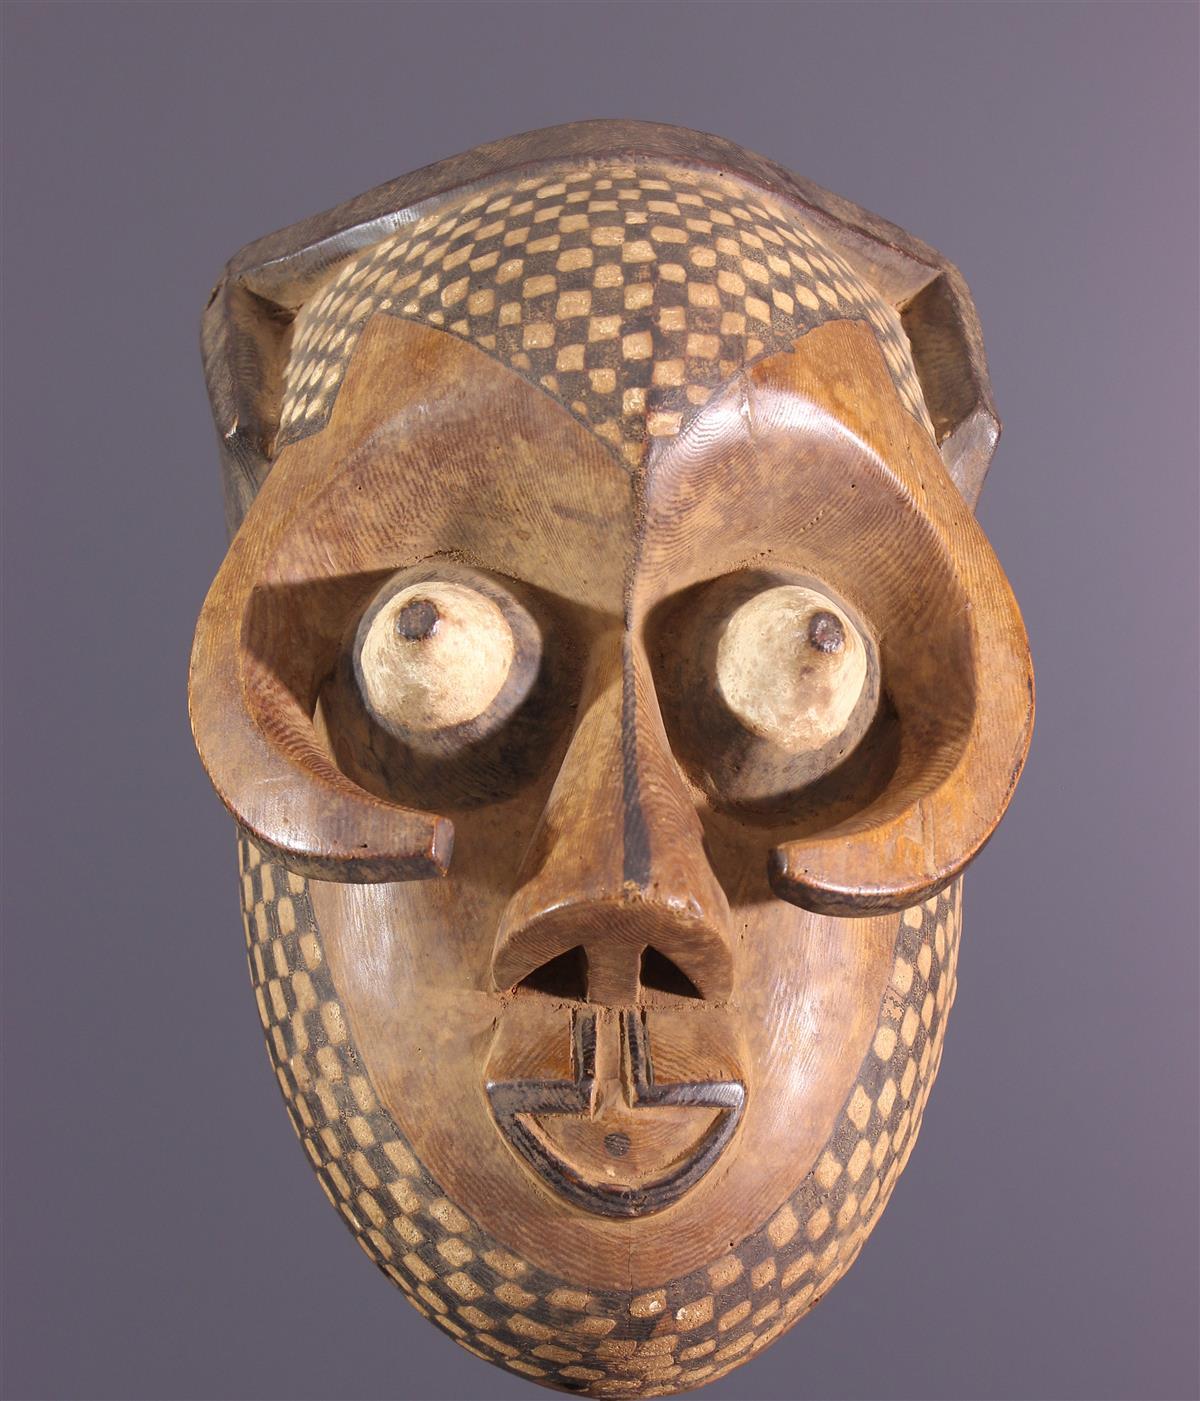 Masque Kuba - Art africain